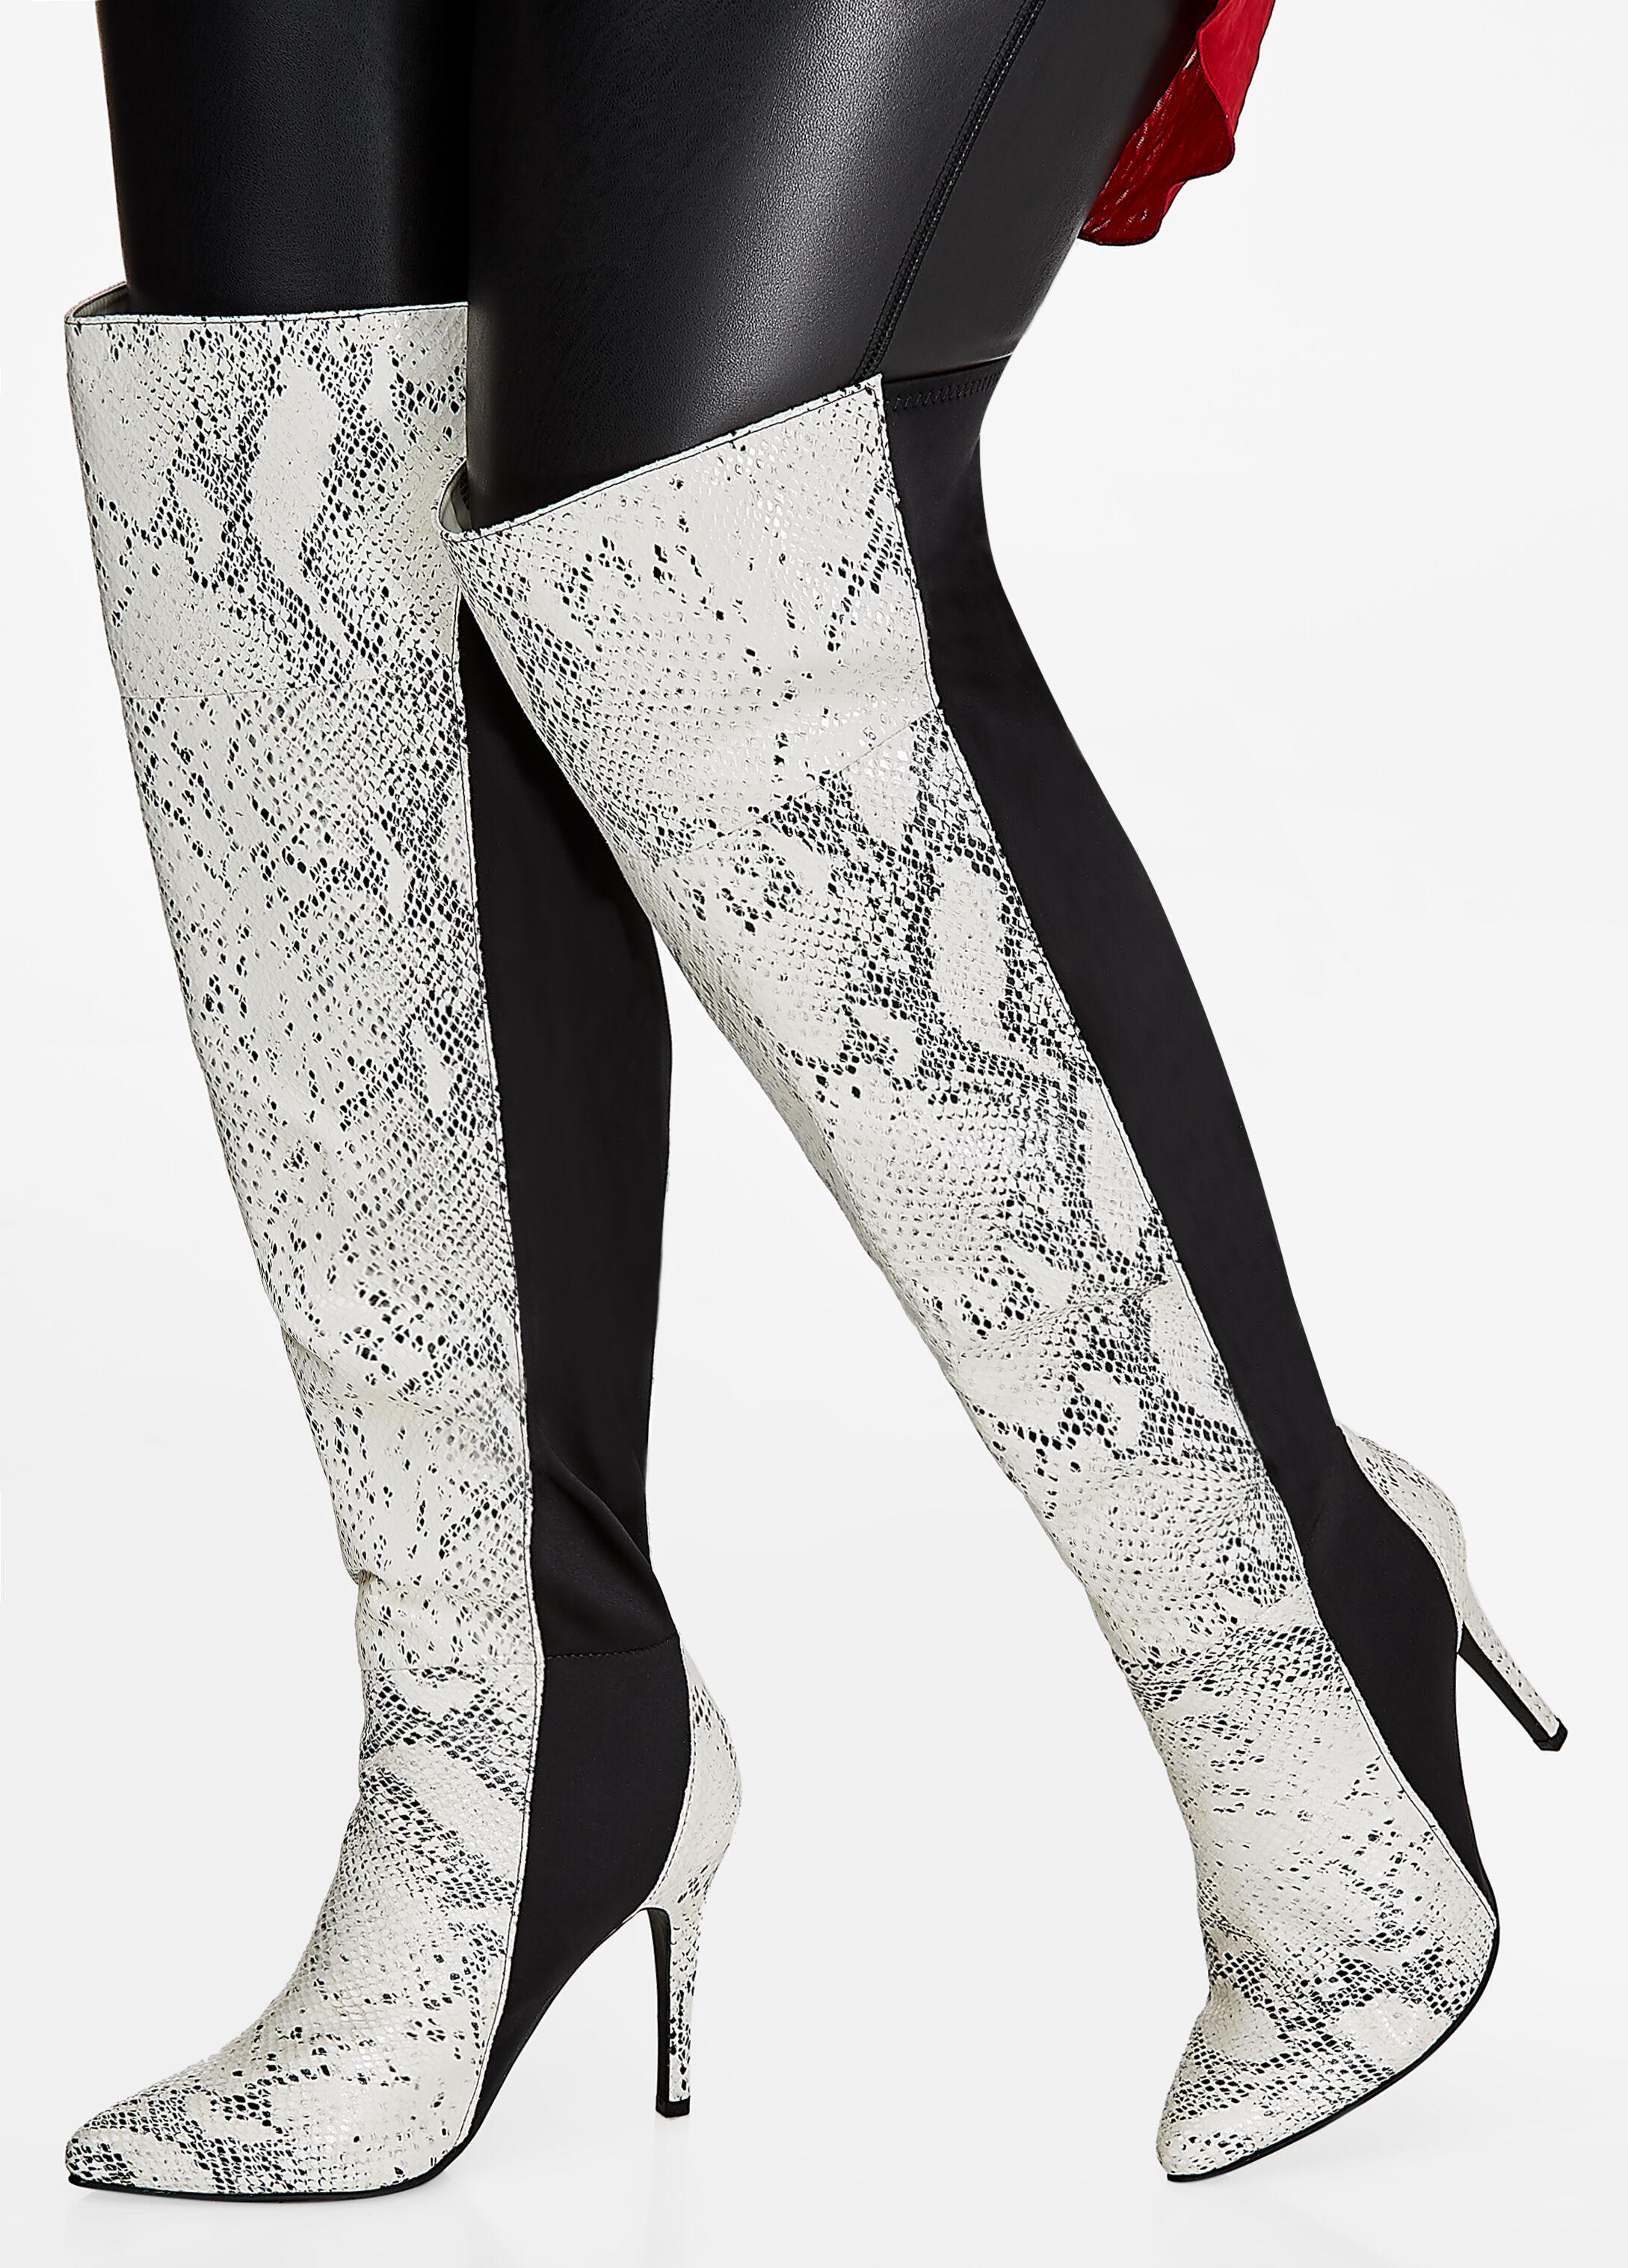 Tall Mixed Snakeskin Boots - Wide-Width, Wide Calf